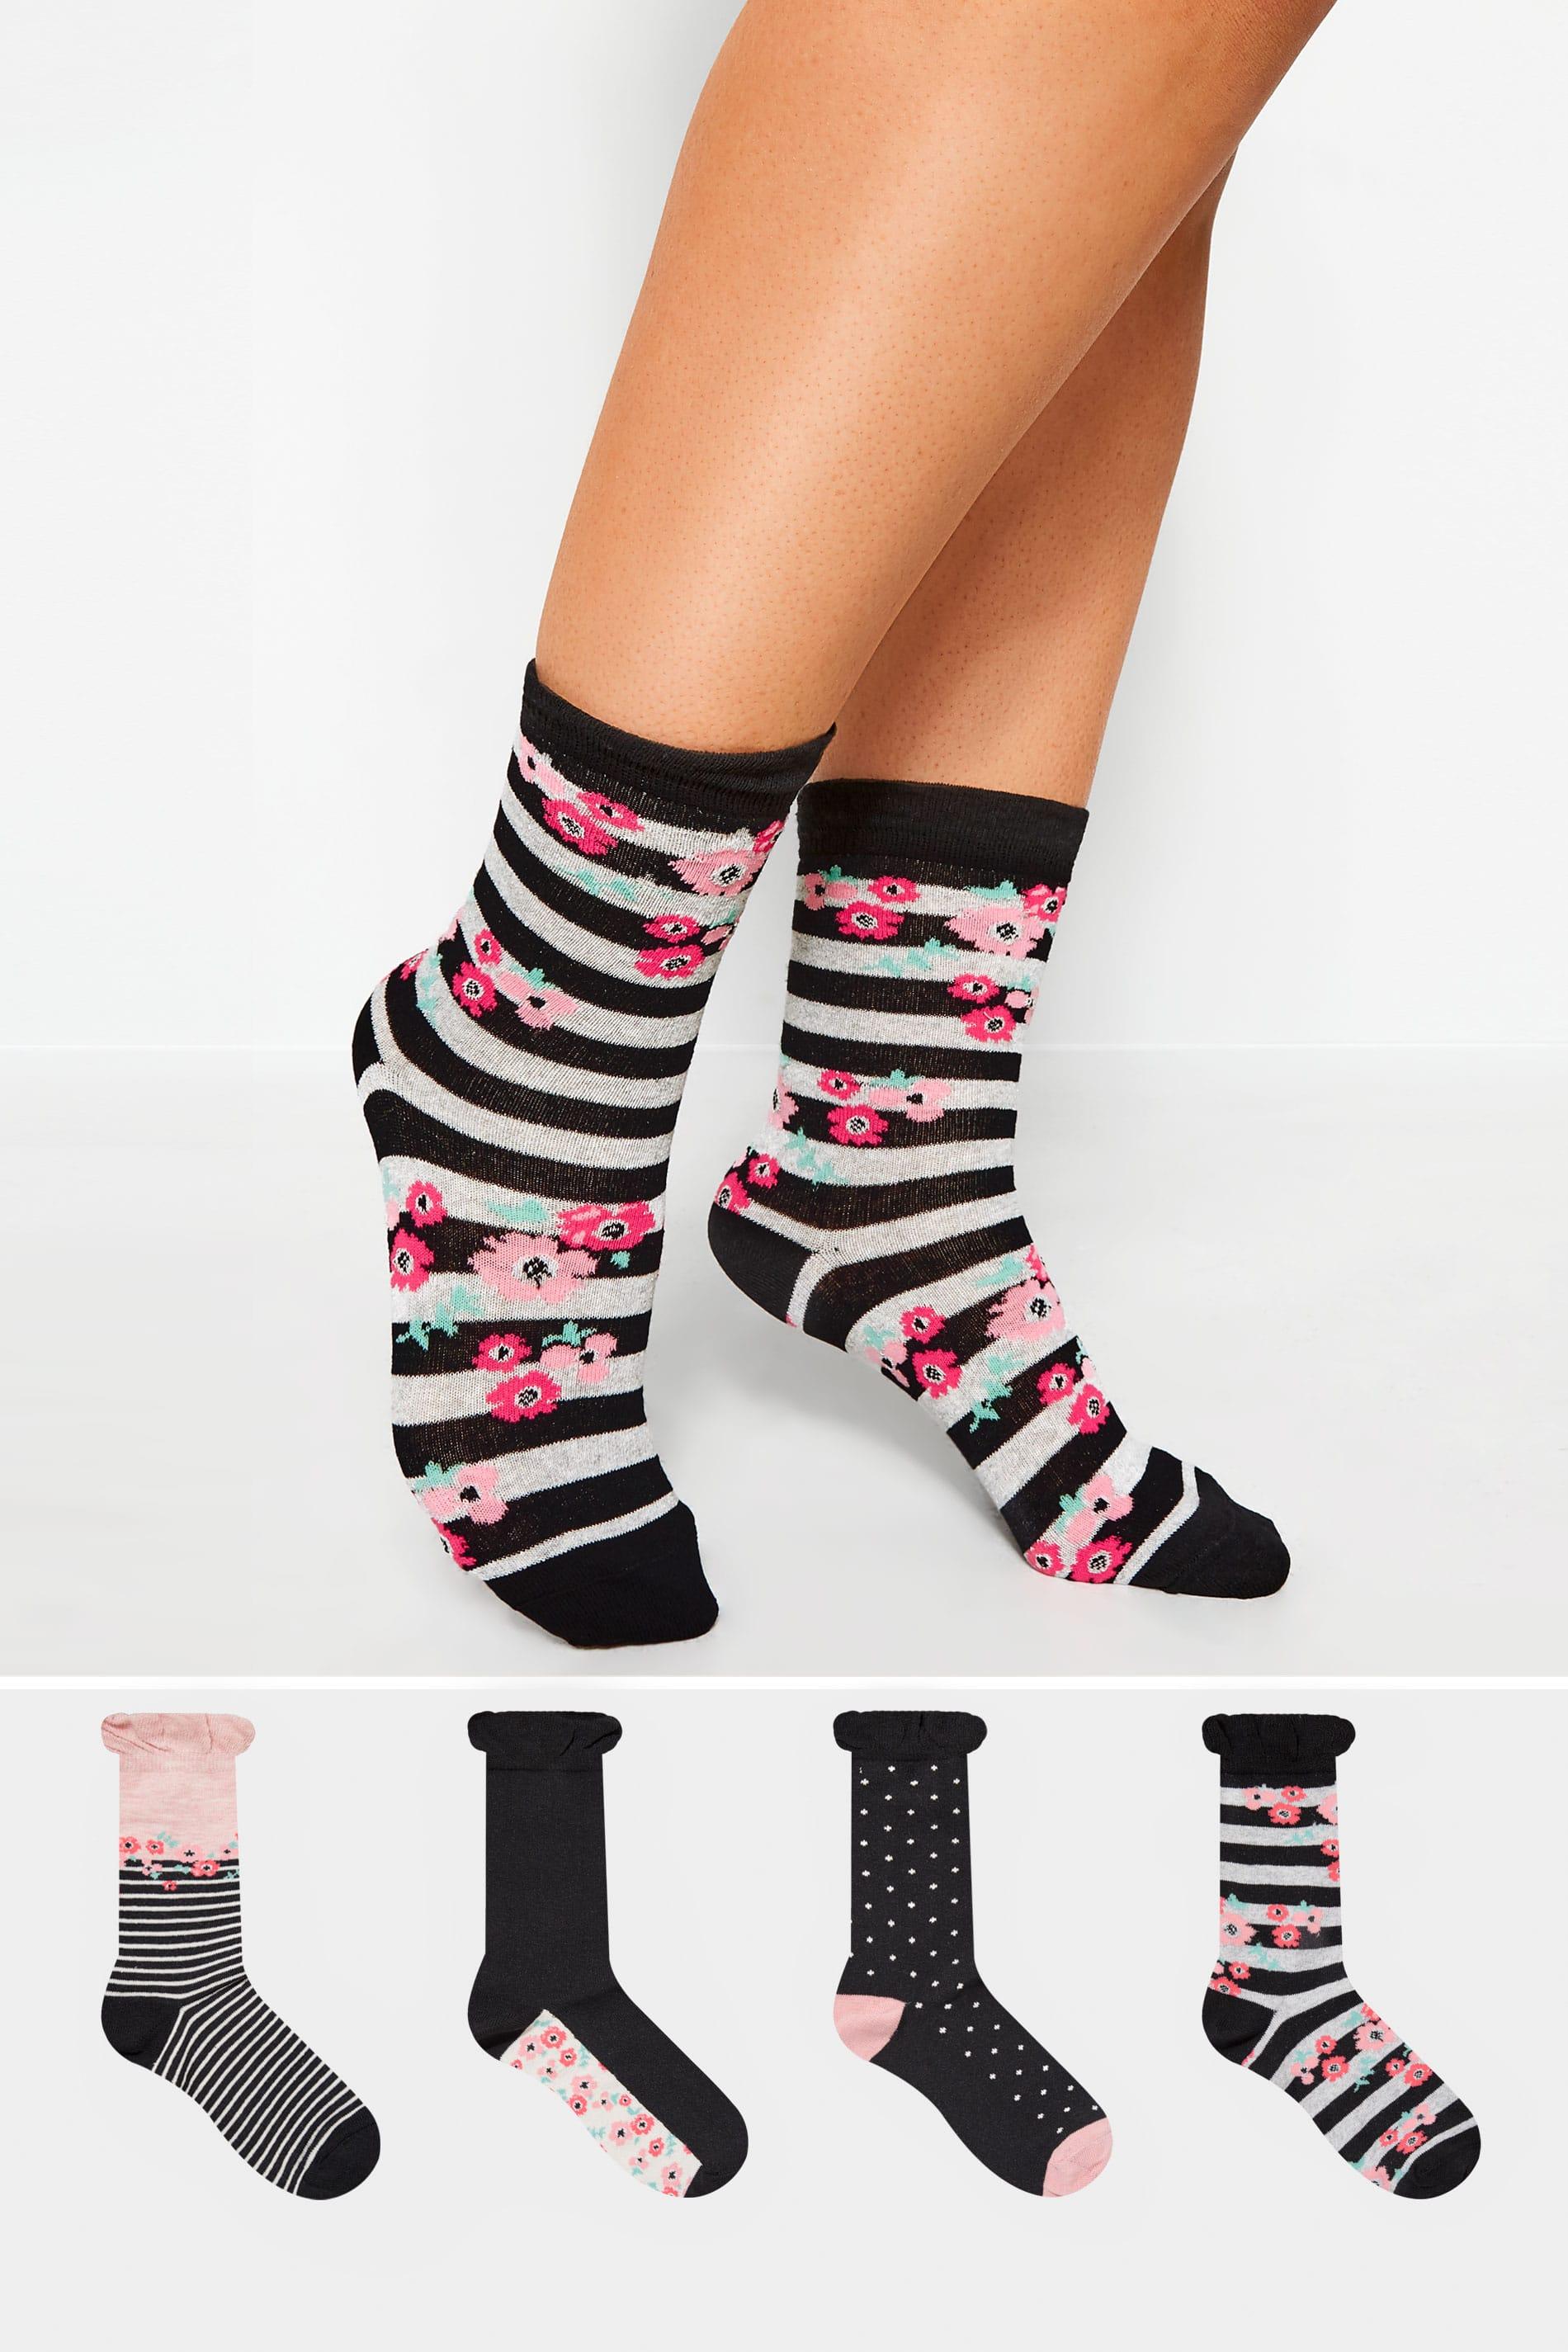 4 PACK Black Floral Stripe Socks